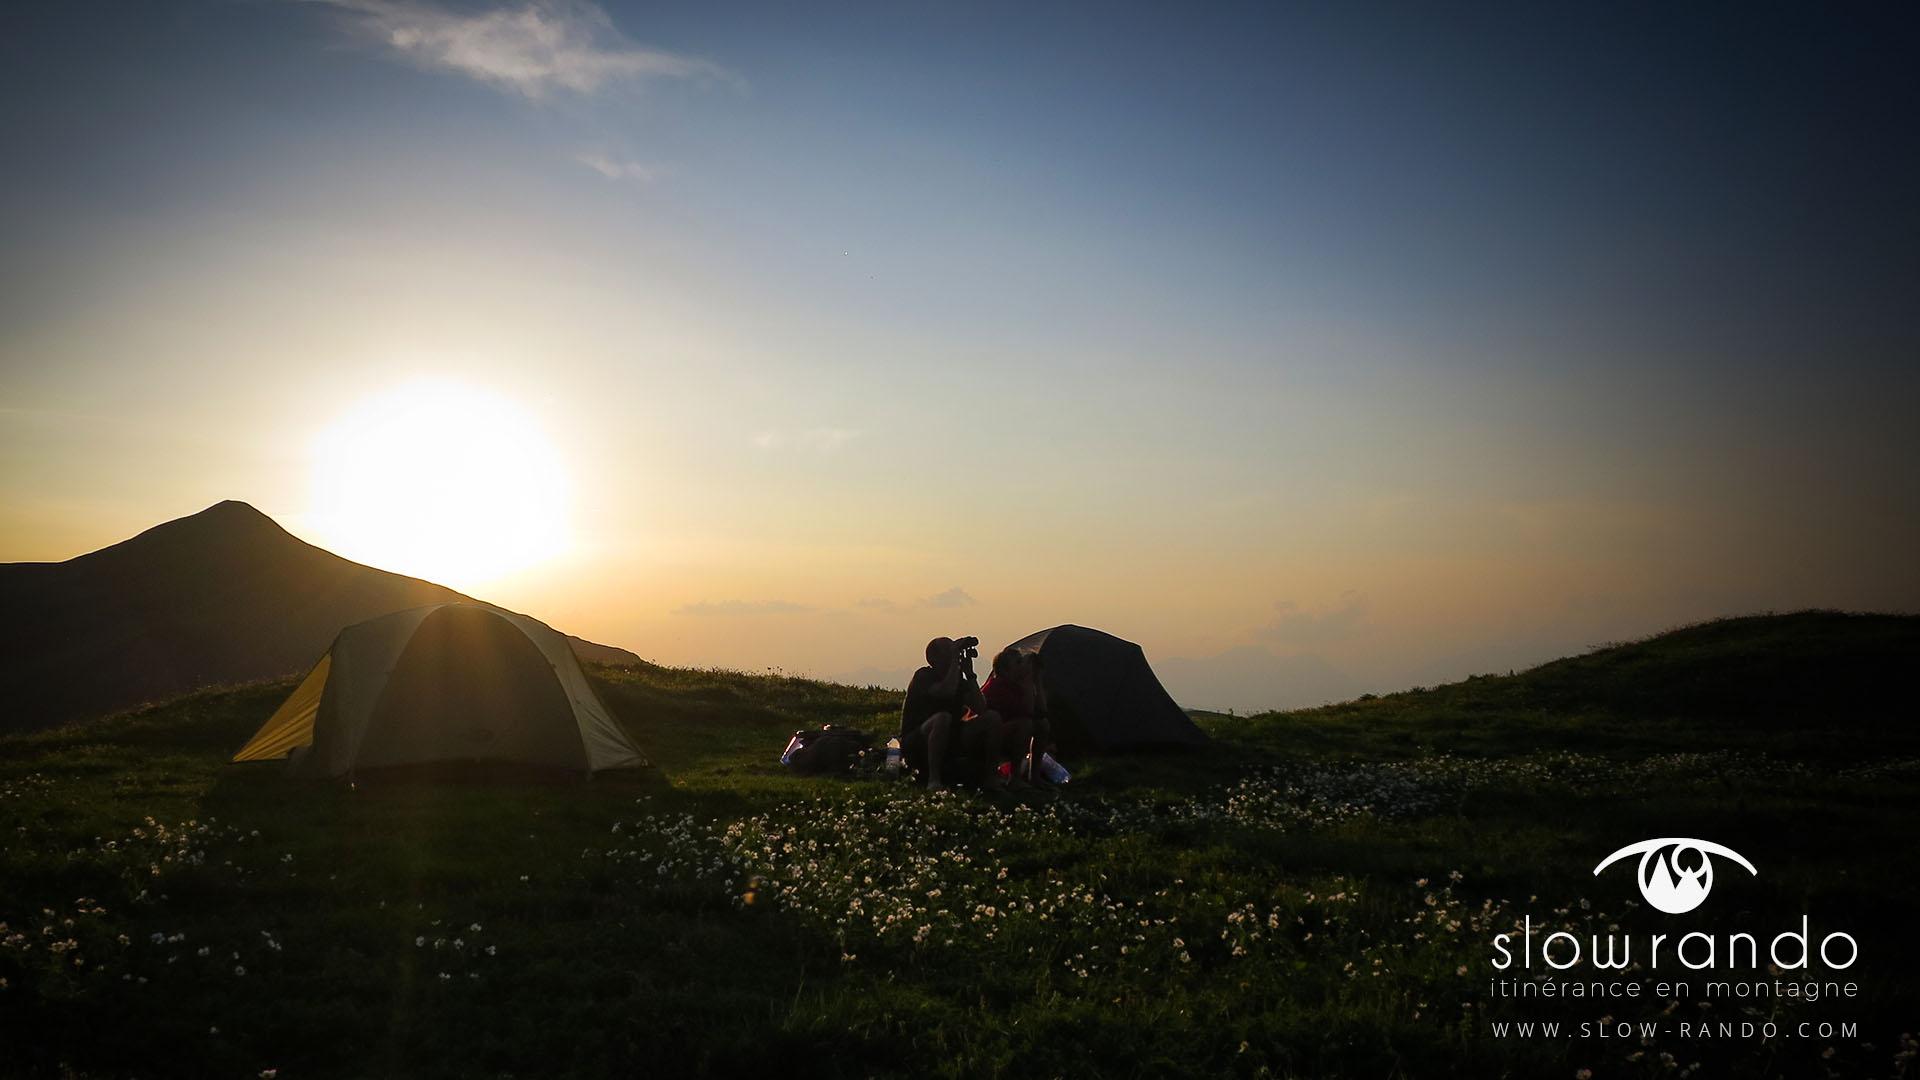 Beaufortain Tour Itinerance Trek Bivouac Observation Tente Slow Rando